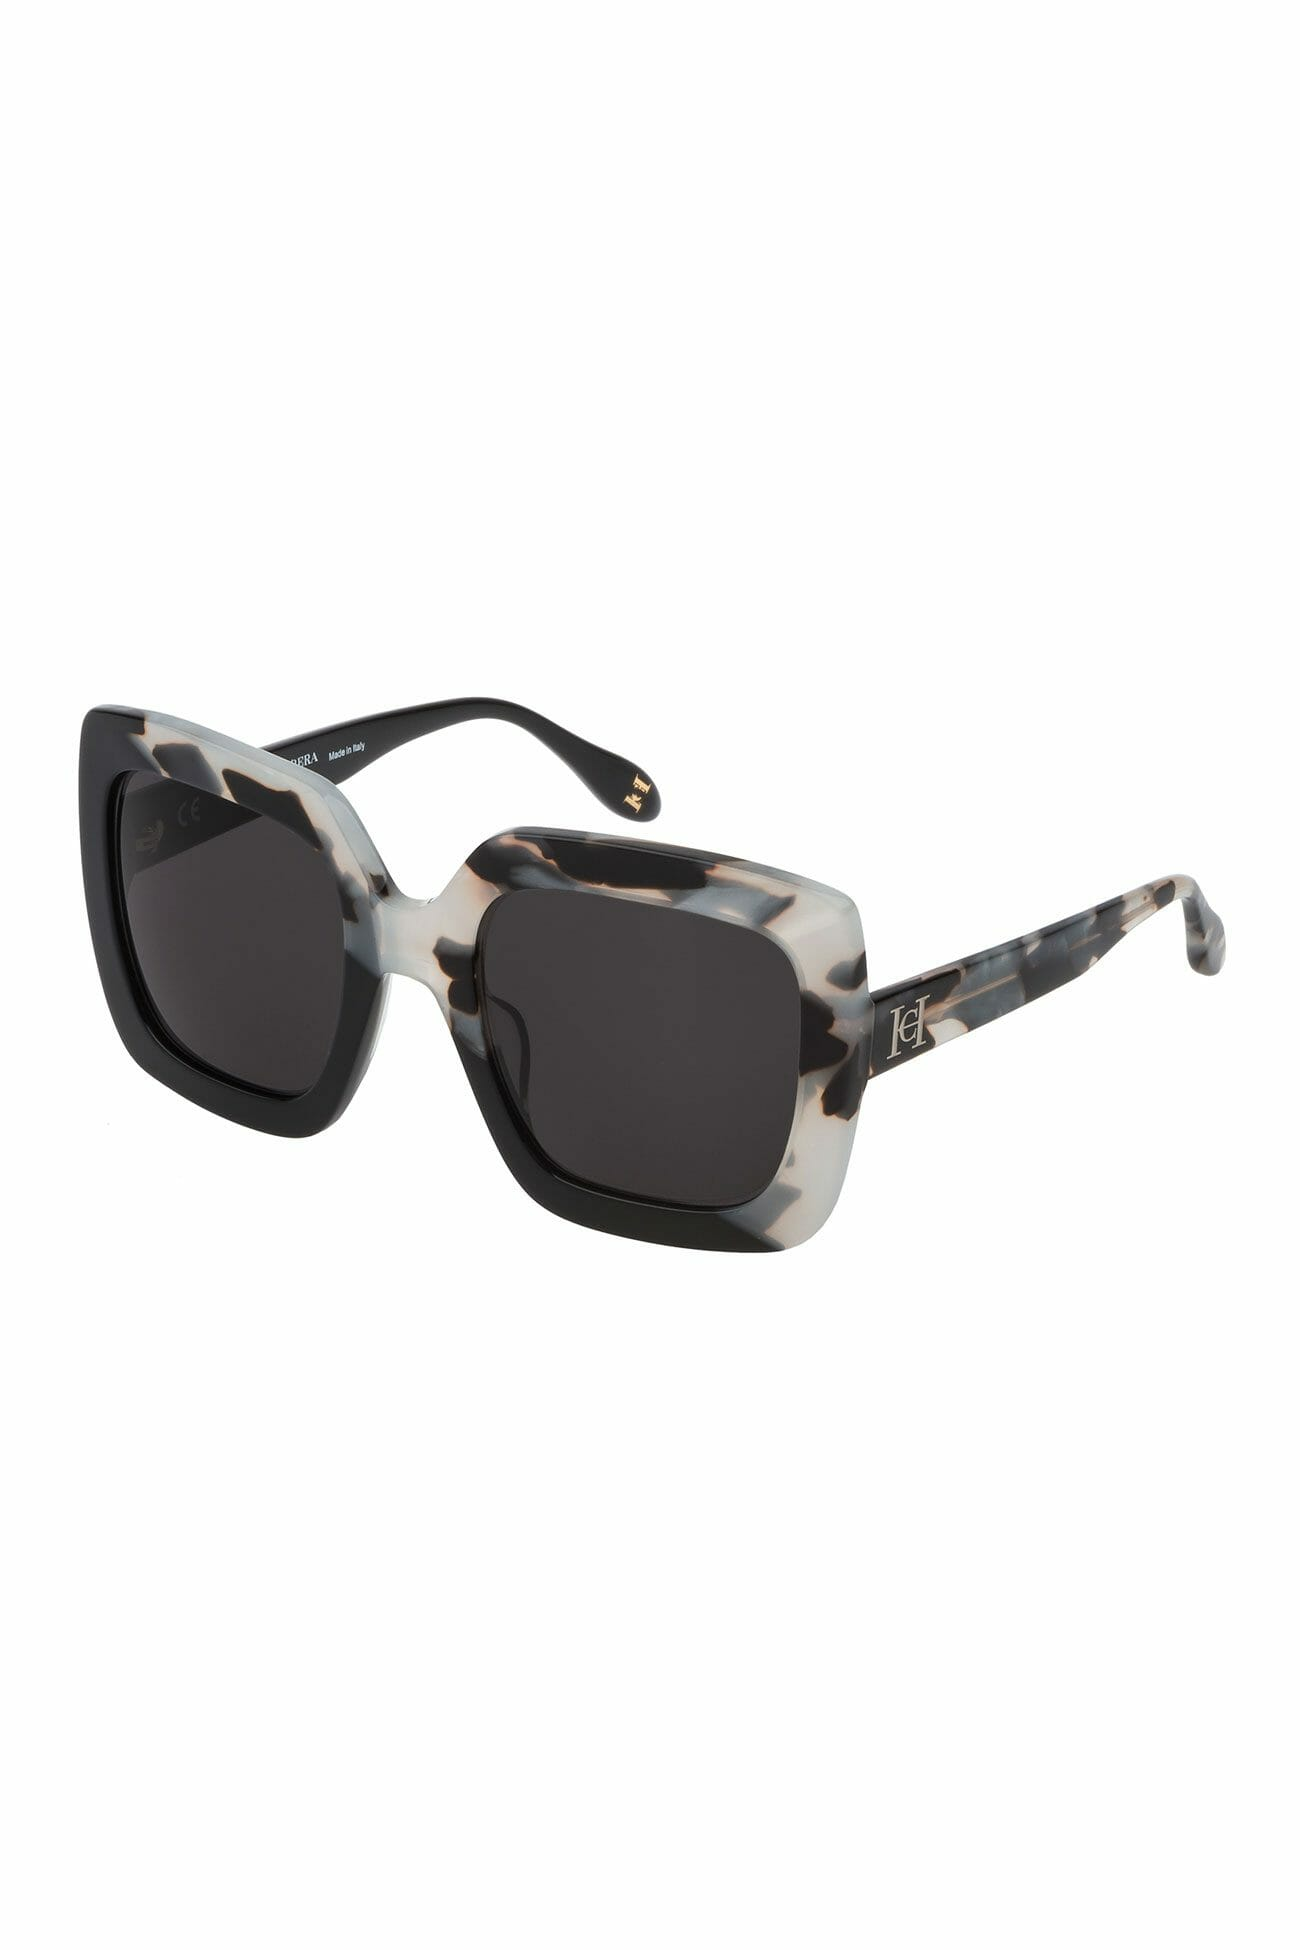 CHNY-Carolina-Herrera-New-York-очки-женские